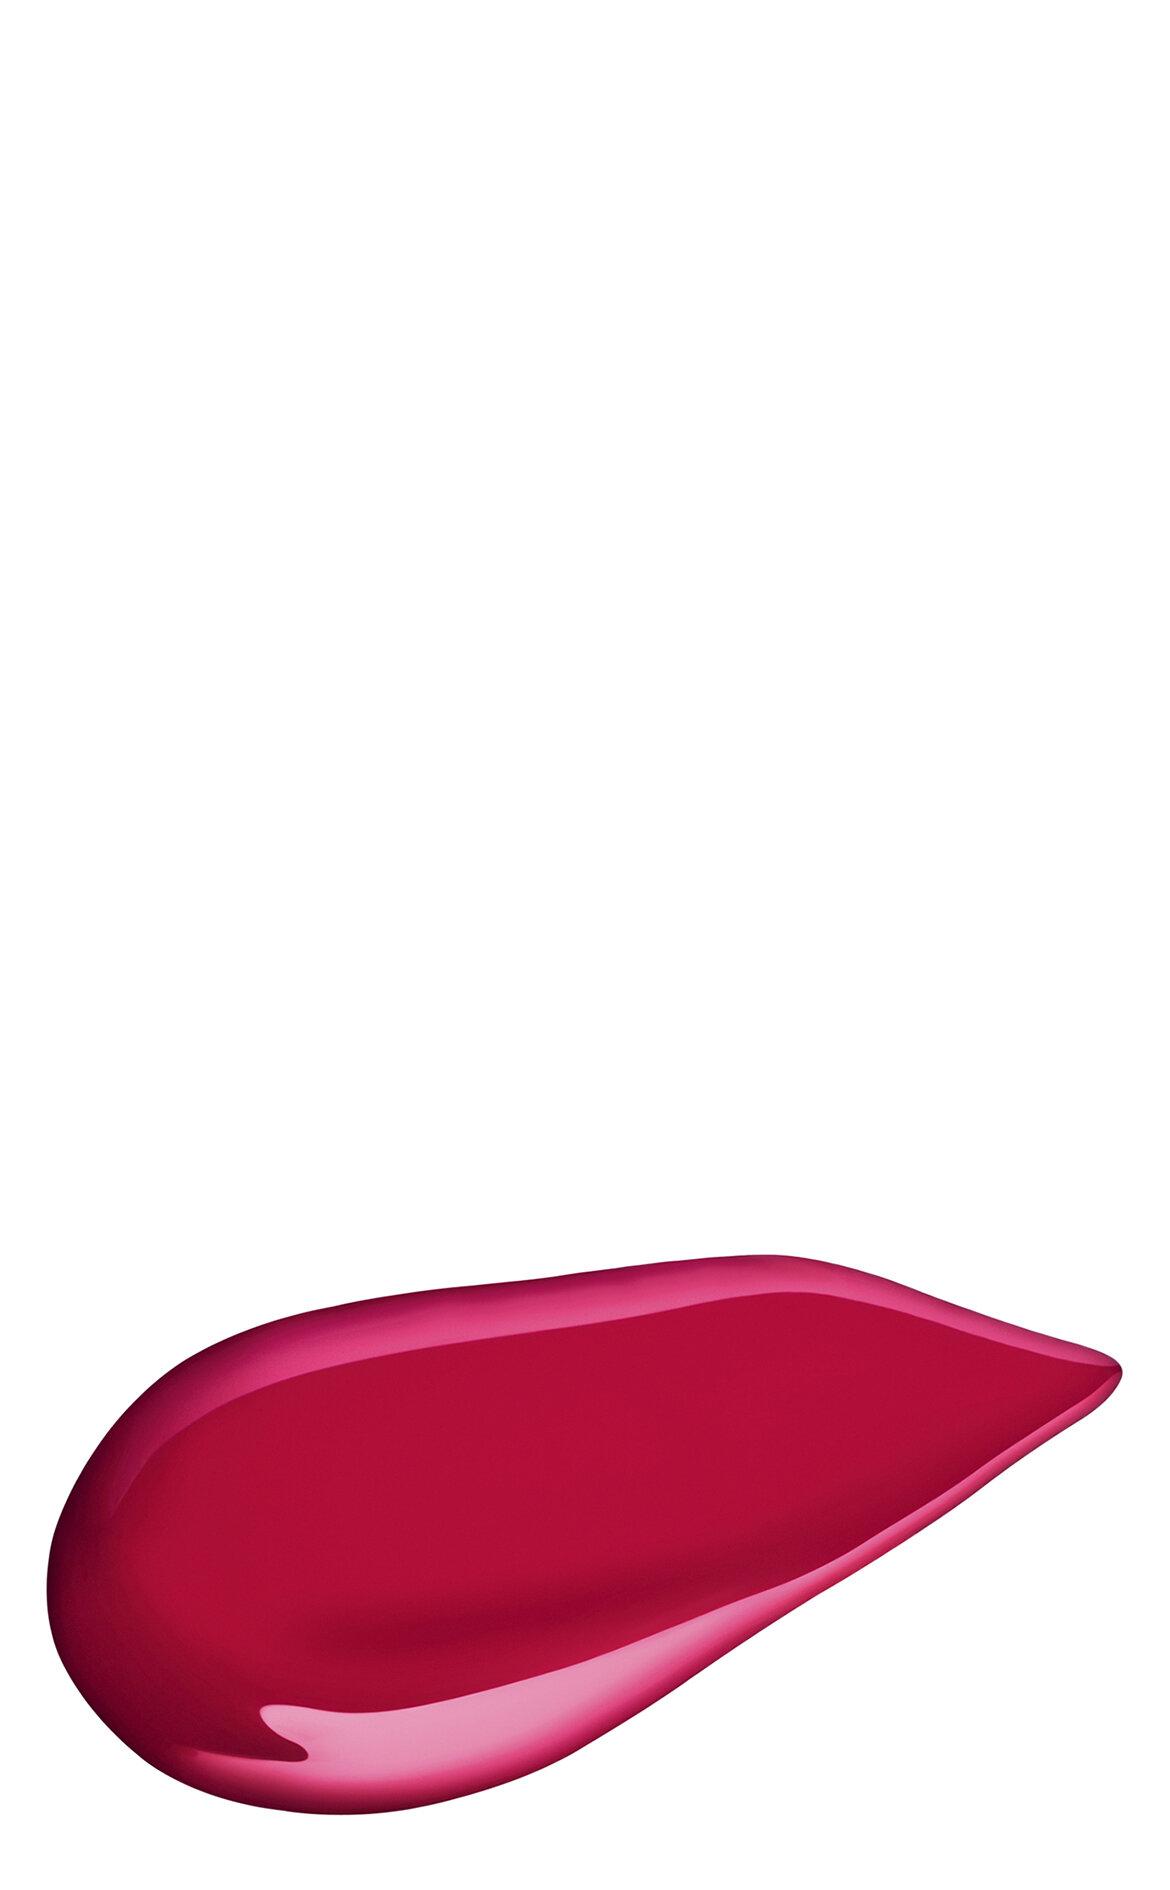 Shiseido-Shiseido Lacquer Rouge Rd413 Ruj